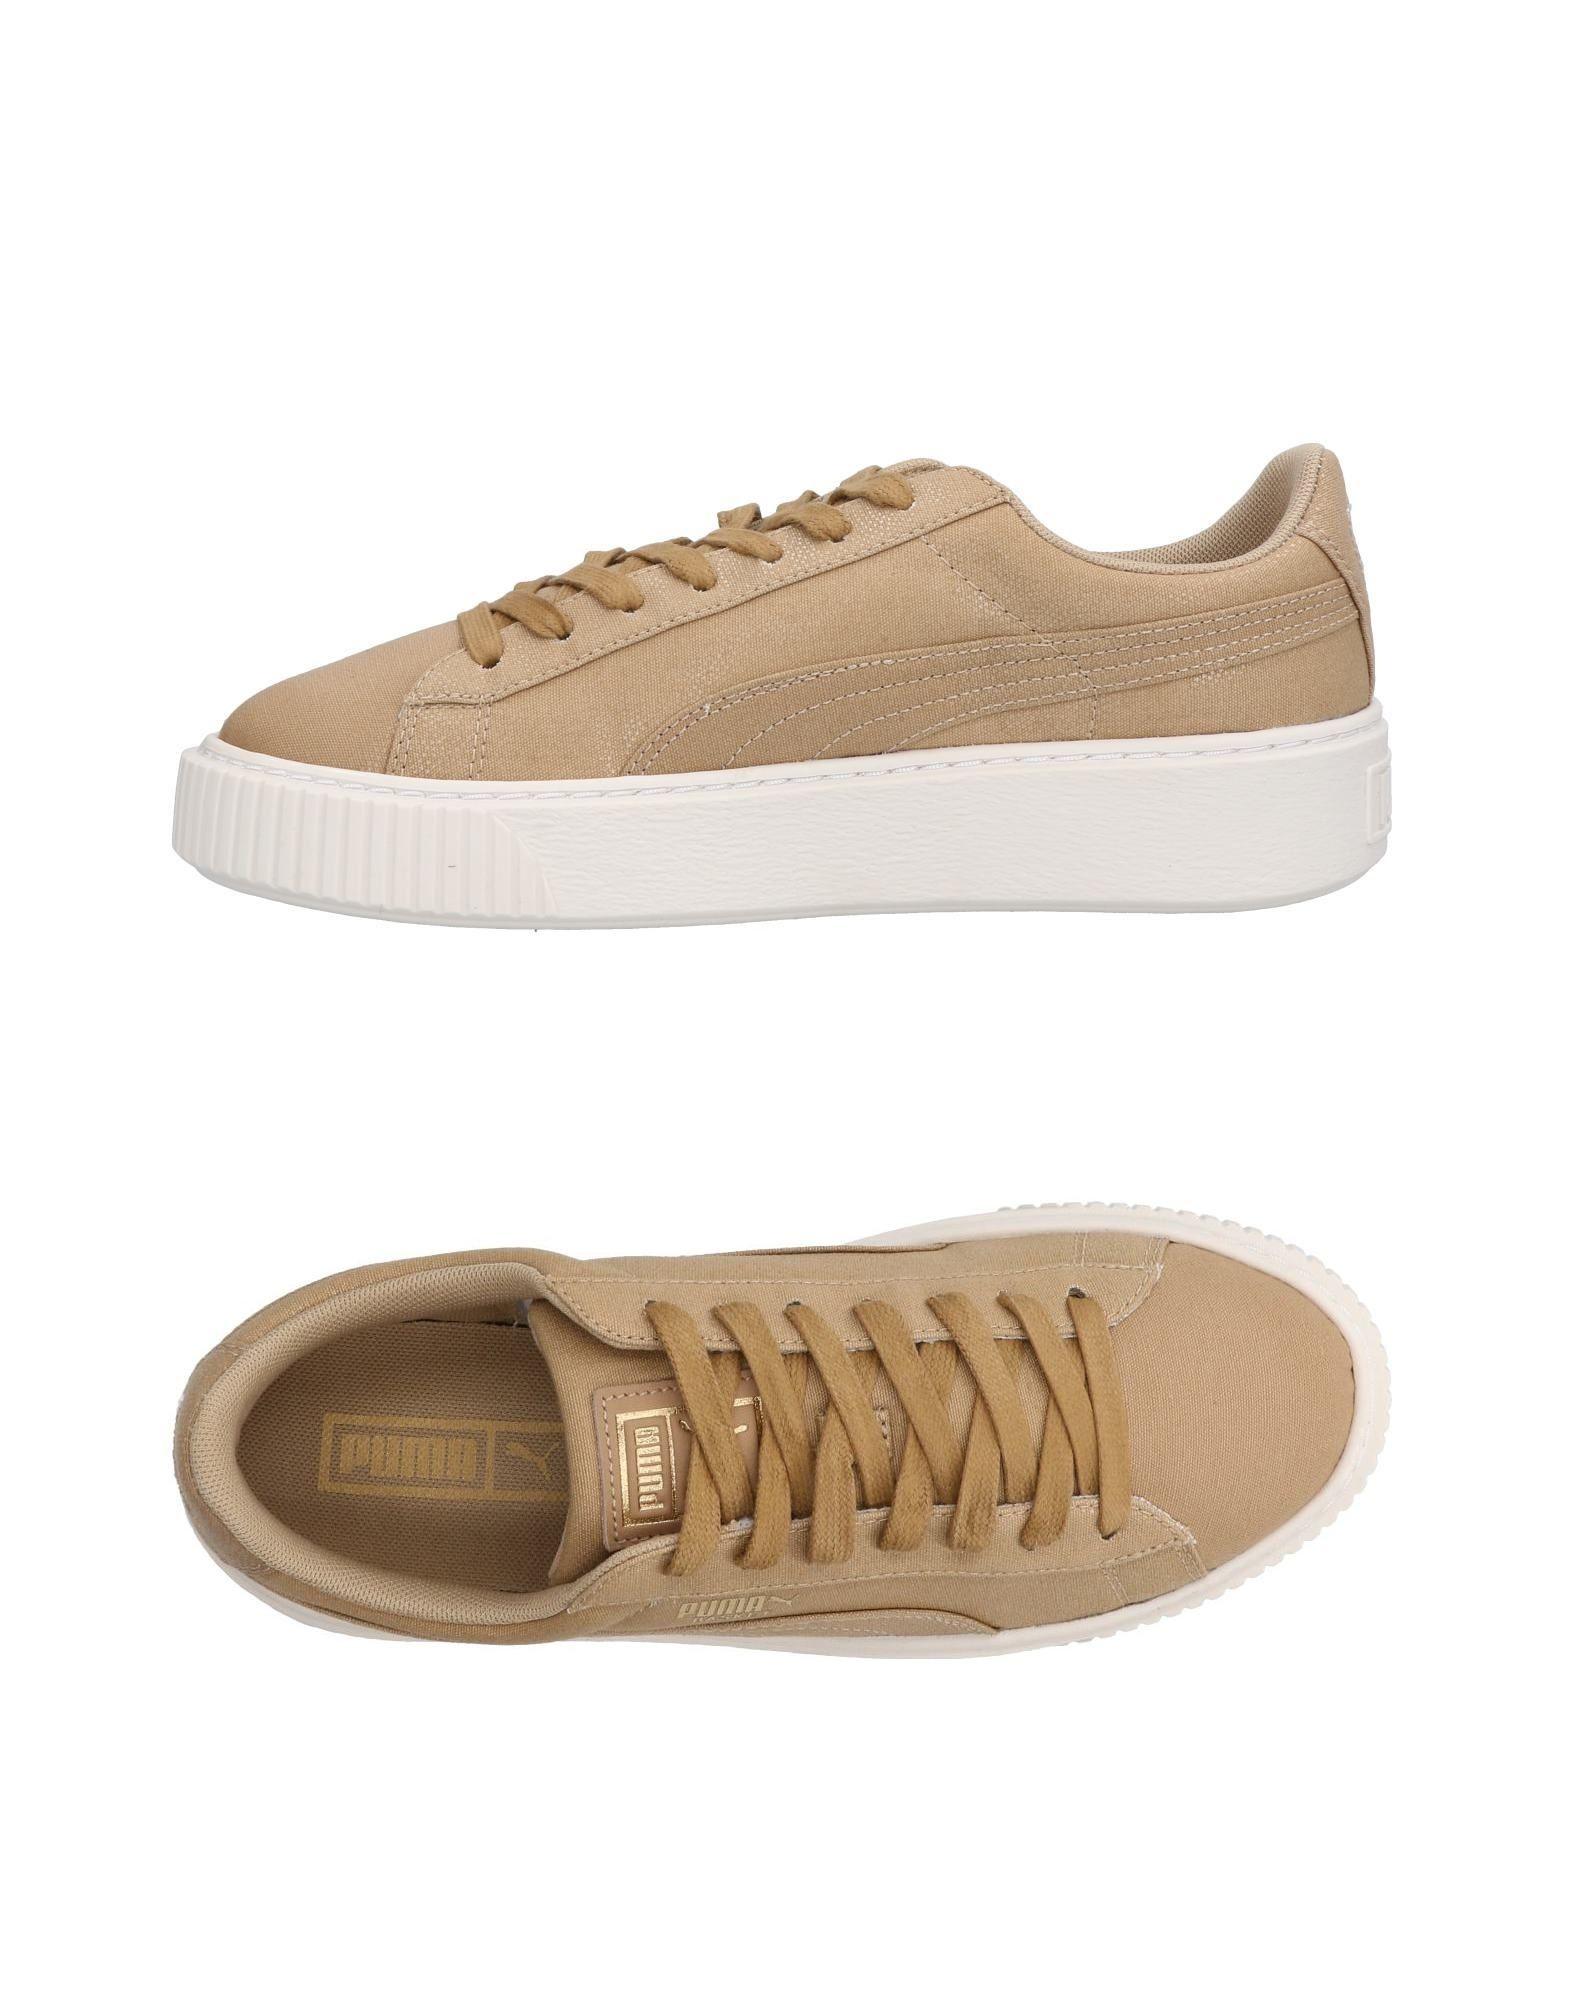 PUMA Damen Low Sneakers & Tennisschuhe14